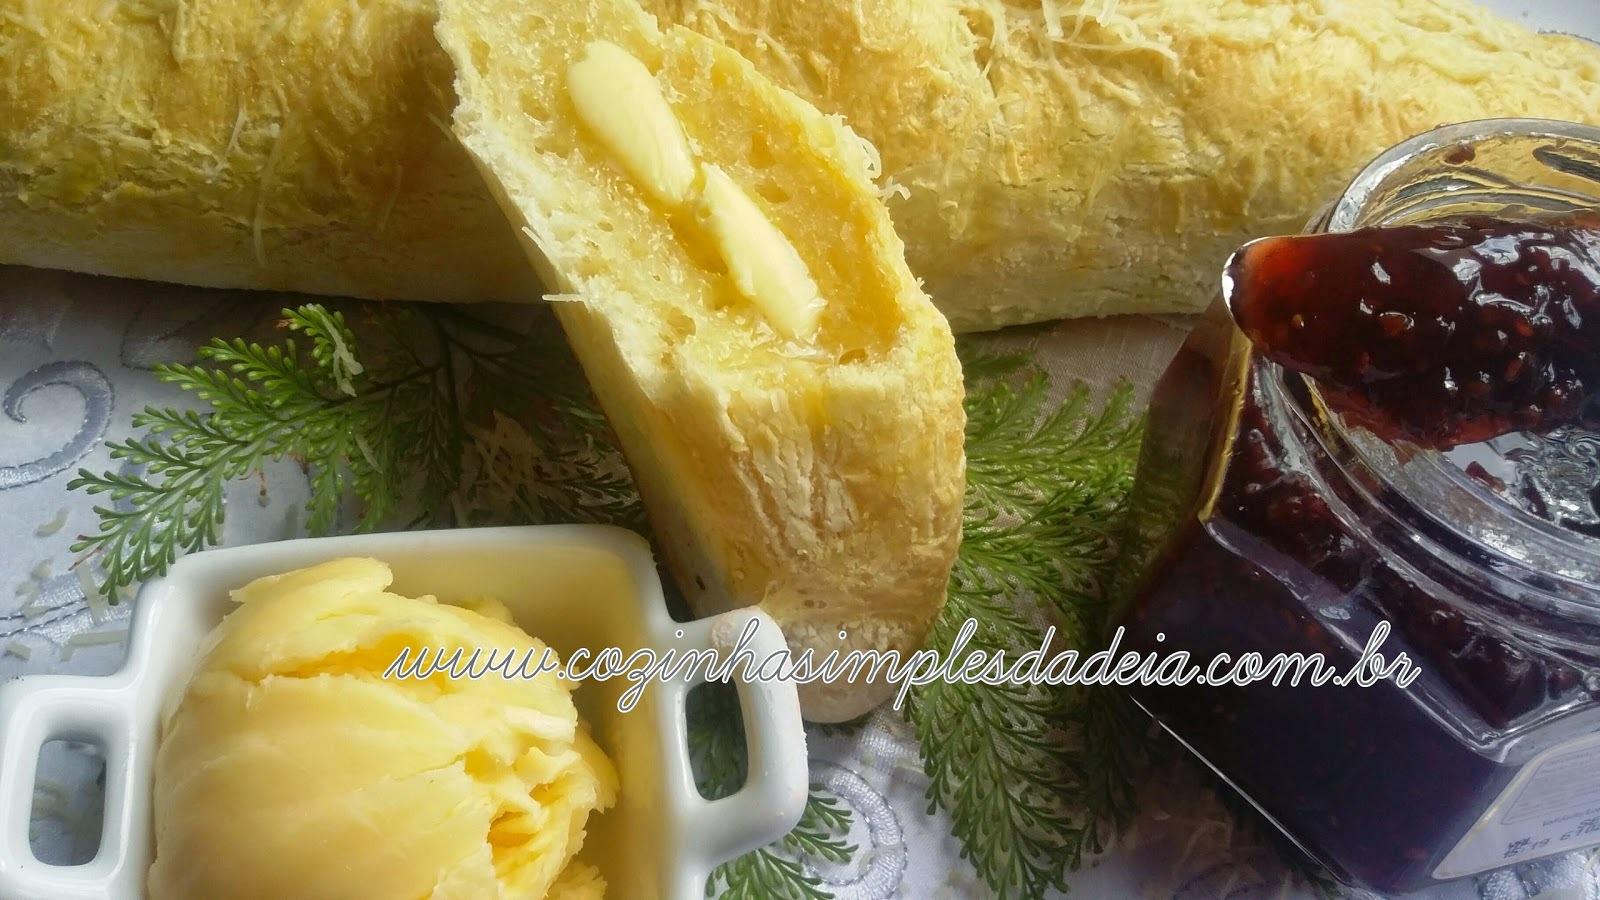 Baguete de Polvilho